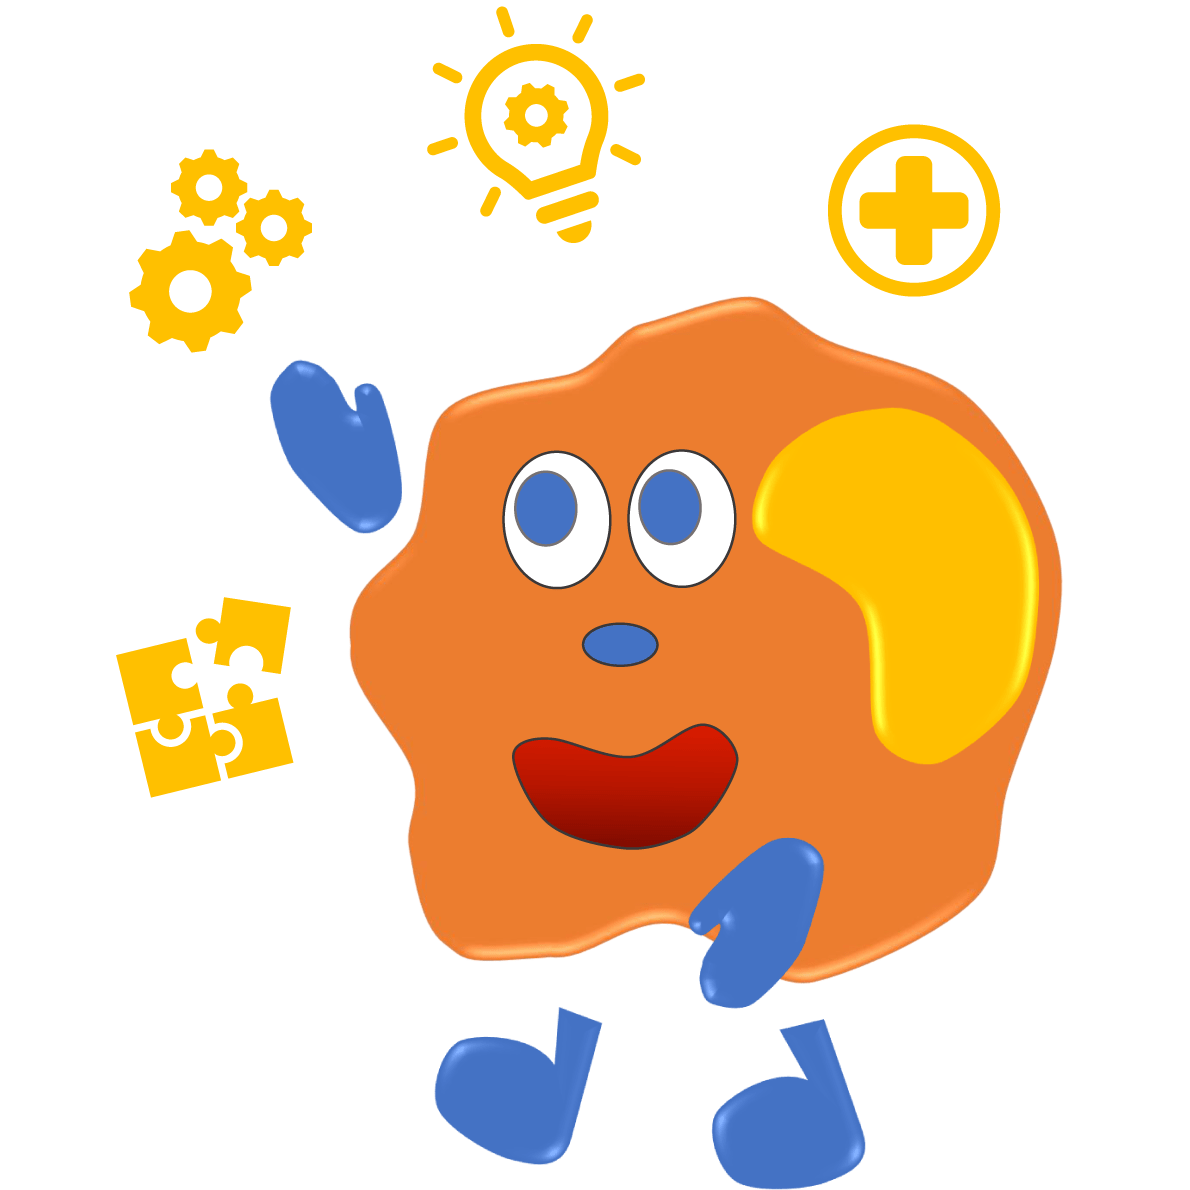 immunologie allergologie TrucsAstcues paiano - CIAO